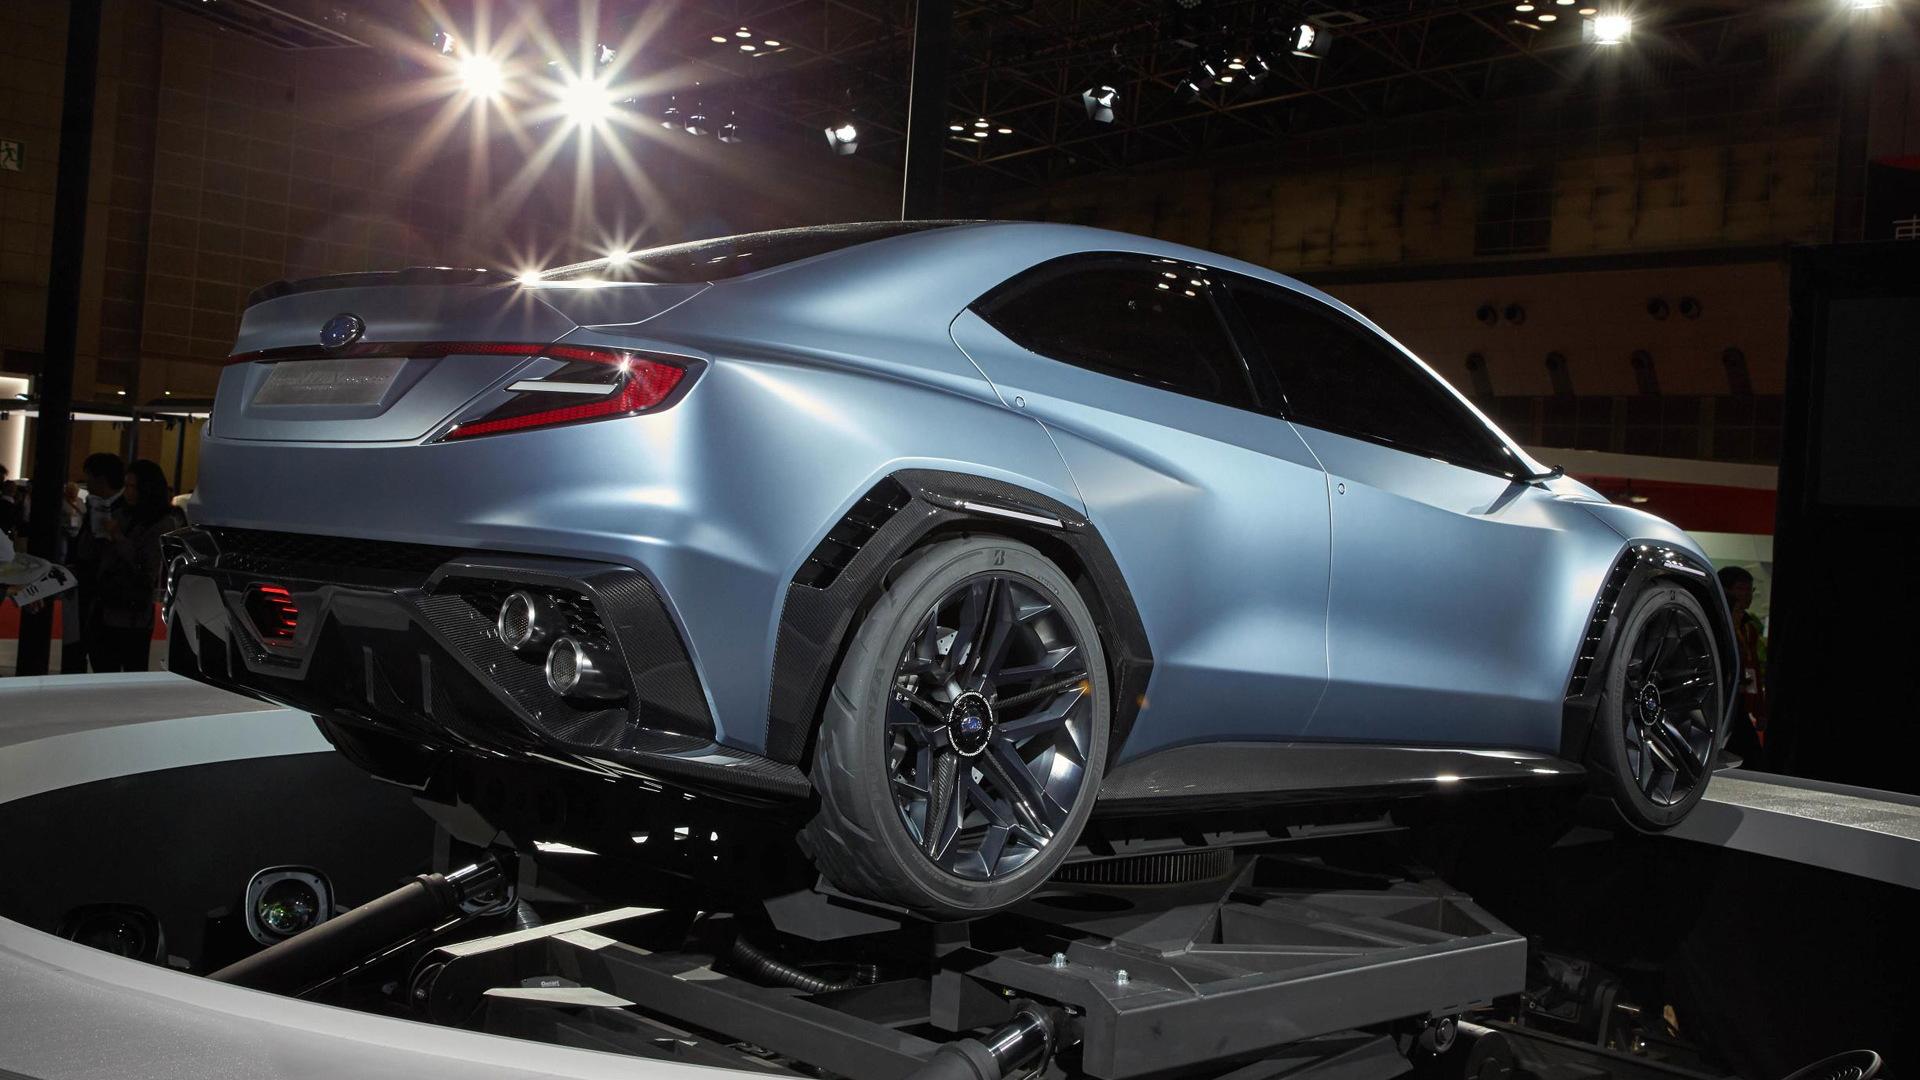 Subaru Hints At Next Gen Wrx With Viziv Performance Concept